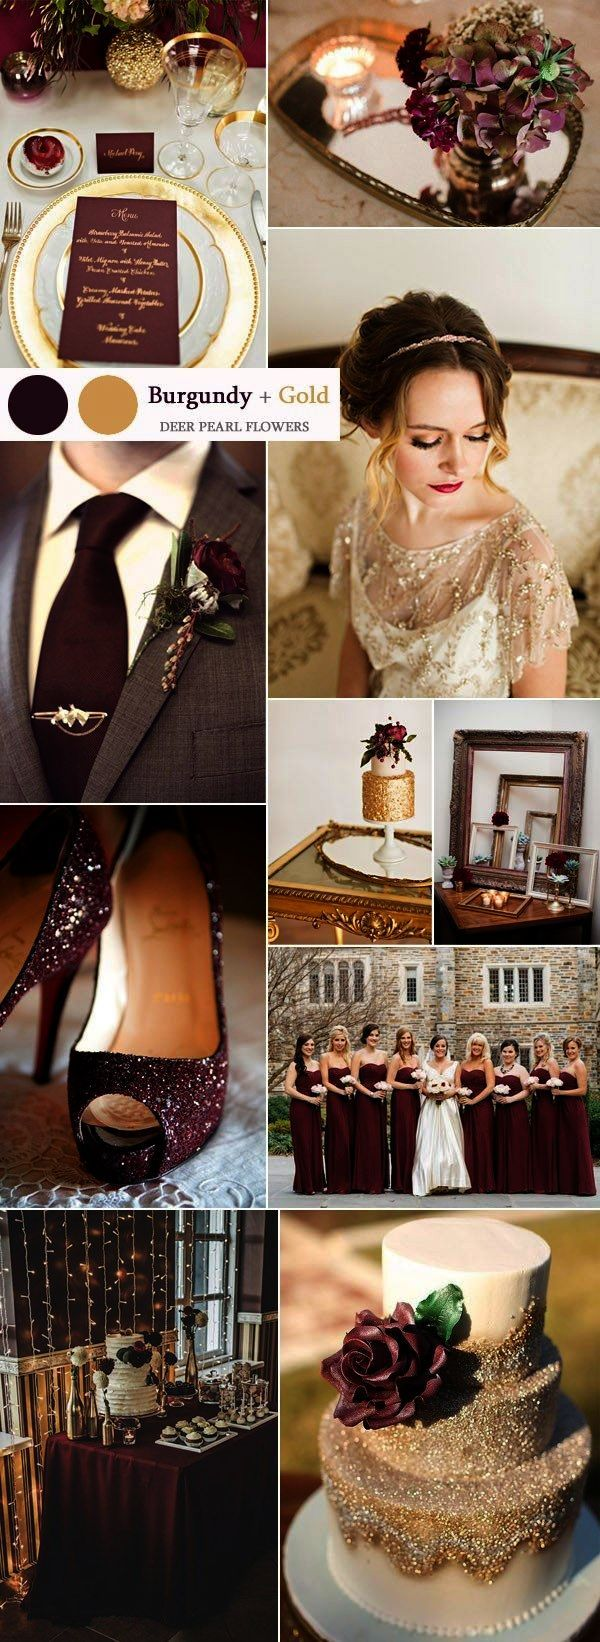 Wedding decorations using pallets october 2018 Wedding Tips Pinterest Unique Wedding Ideas For Reception